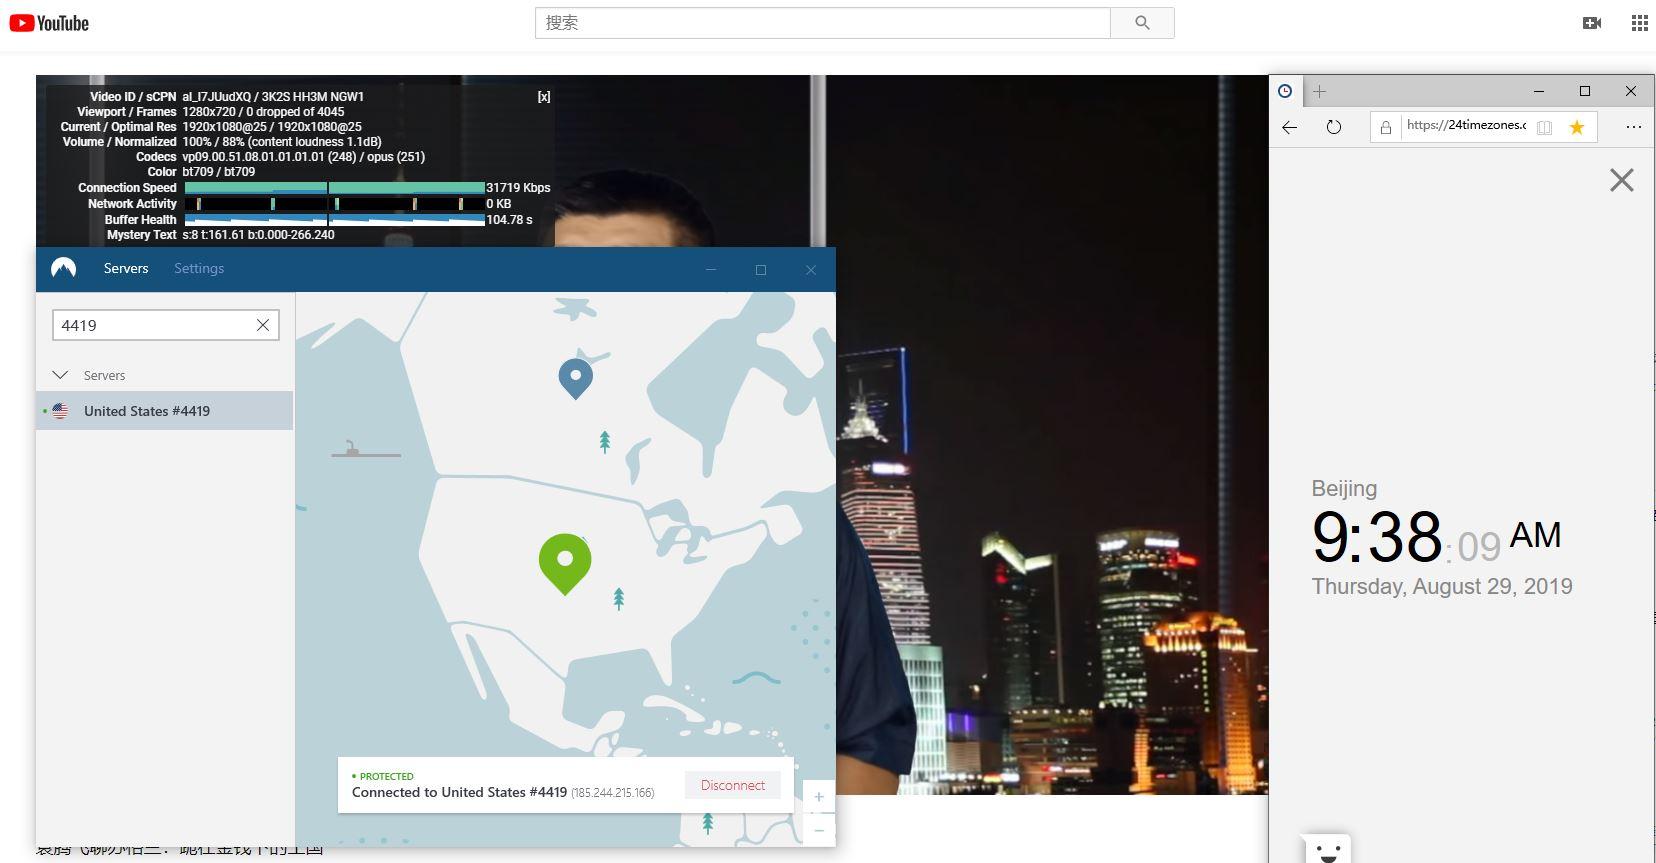 nordvpn windows 美国4419服务器 中国翻墙 科学上网 YouTube测速2-20190829